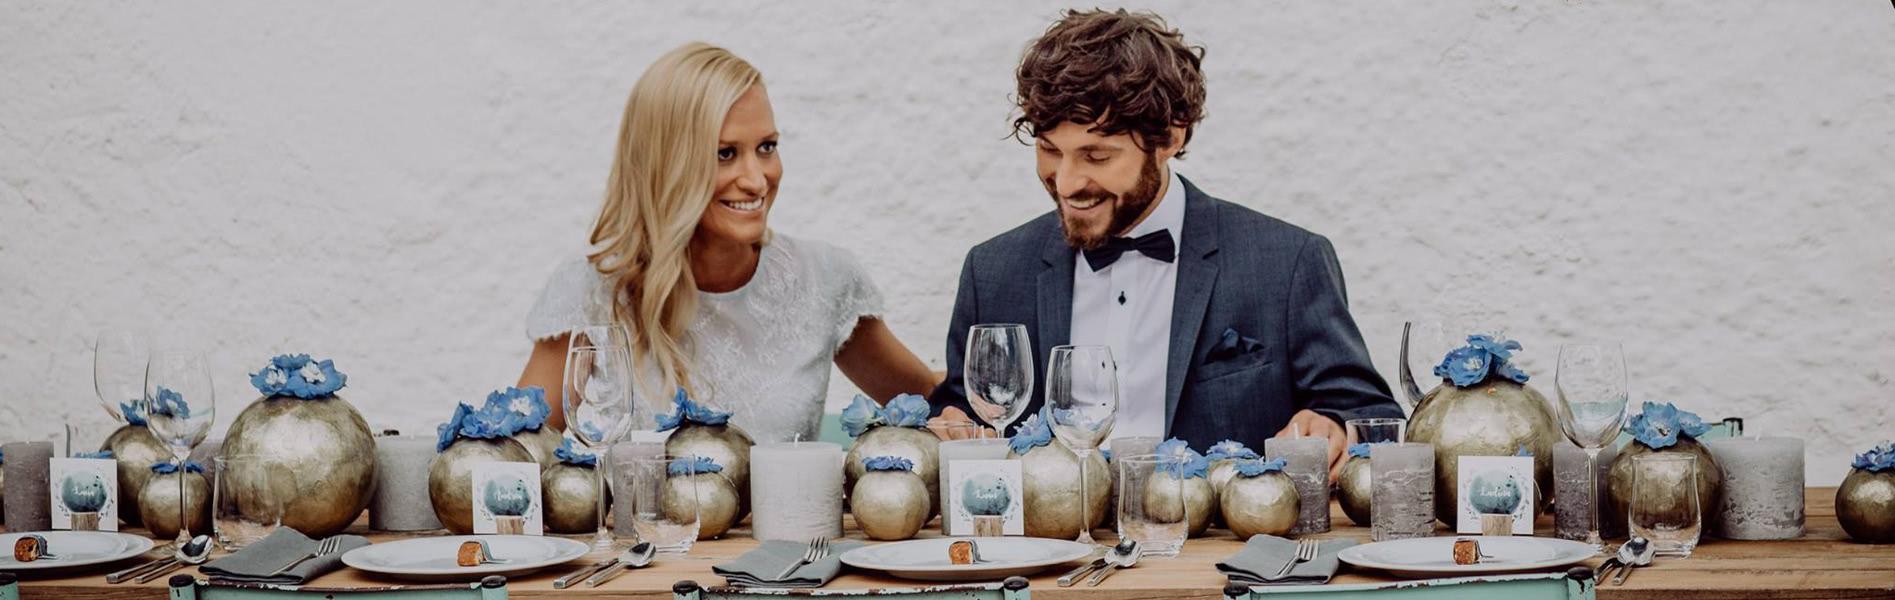 Brautpaar an dekoriertem Tisch